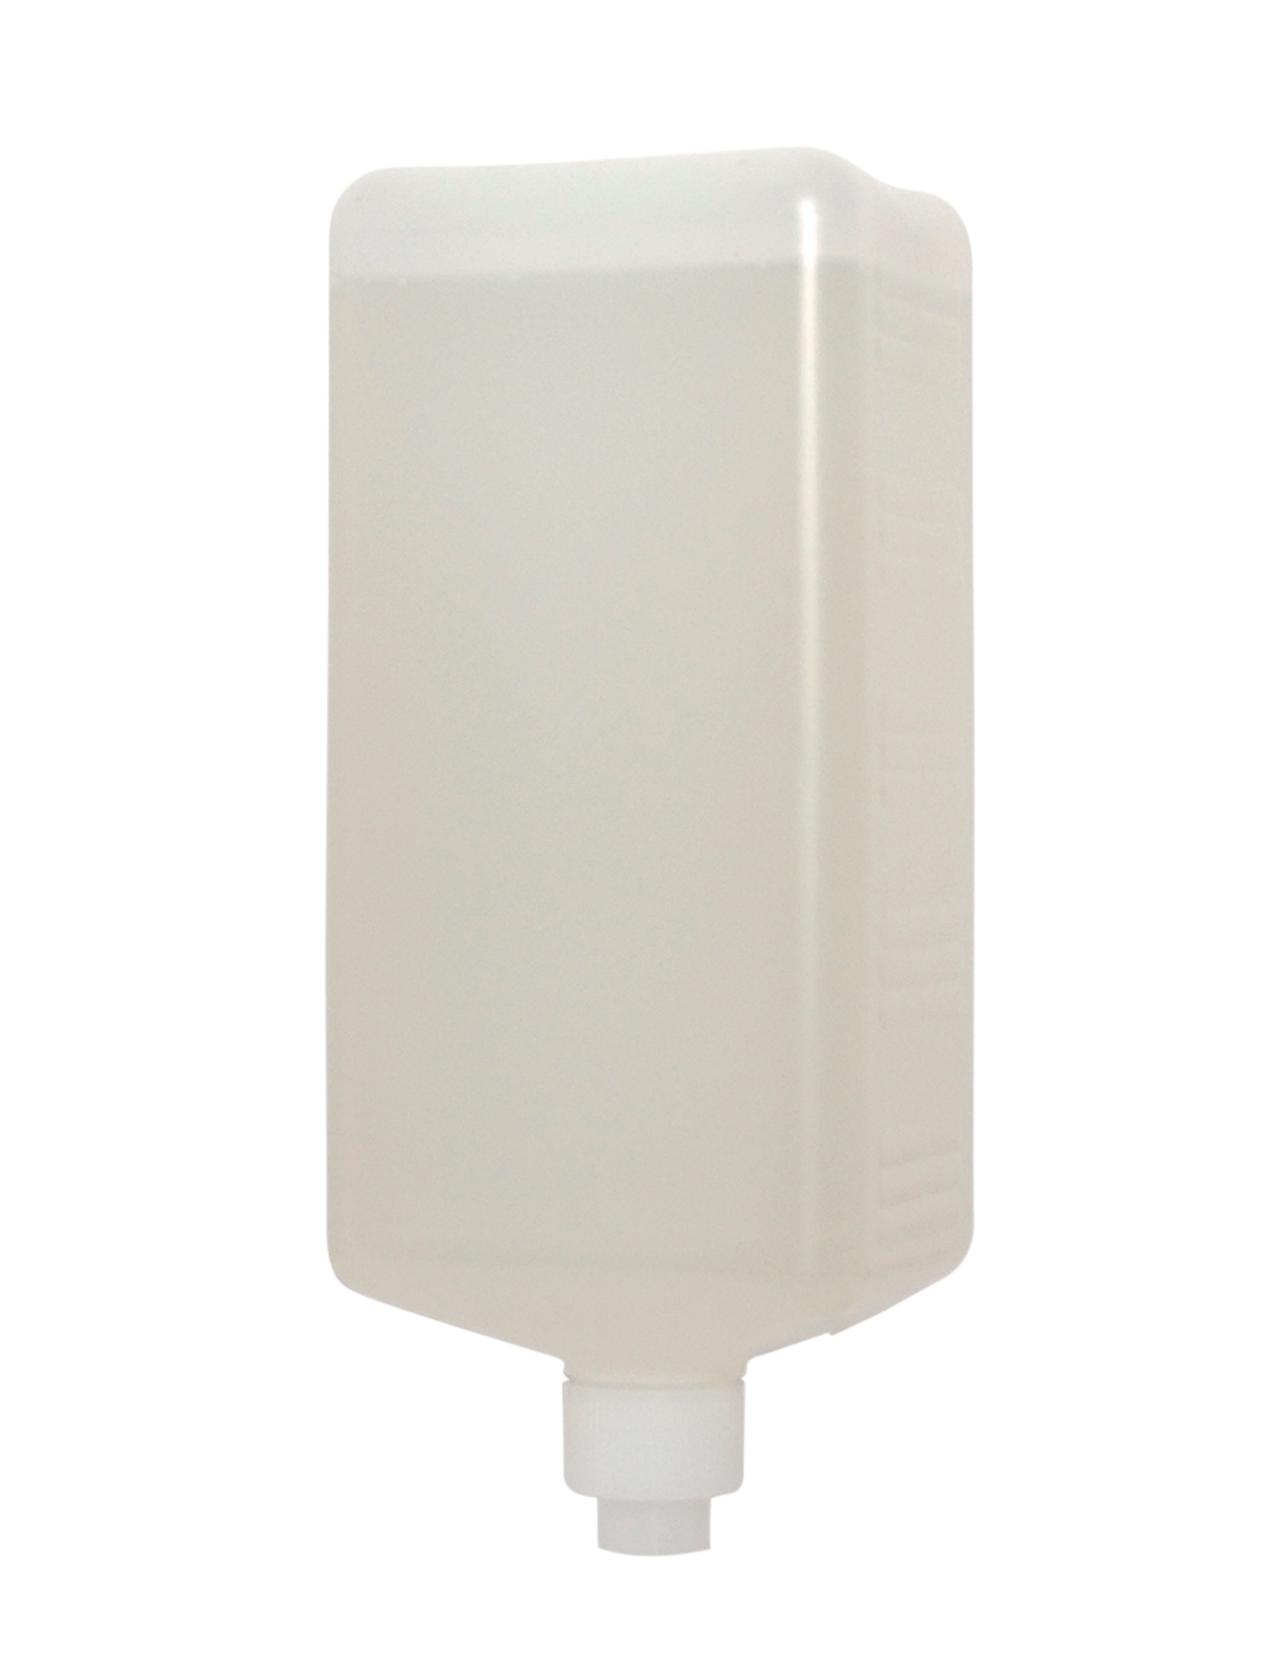 500ml Eurobac hygienische zeep